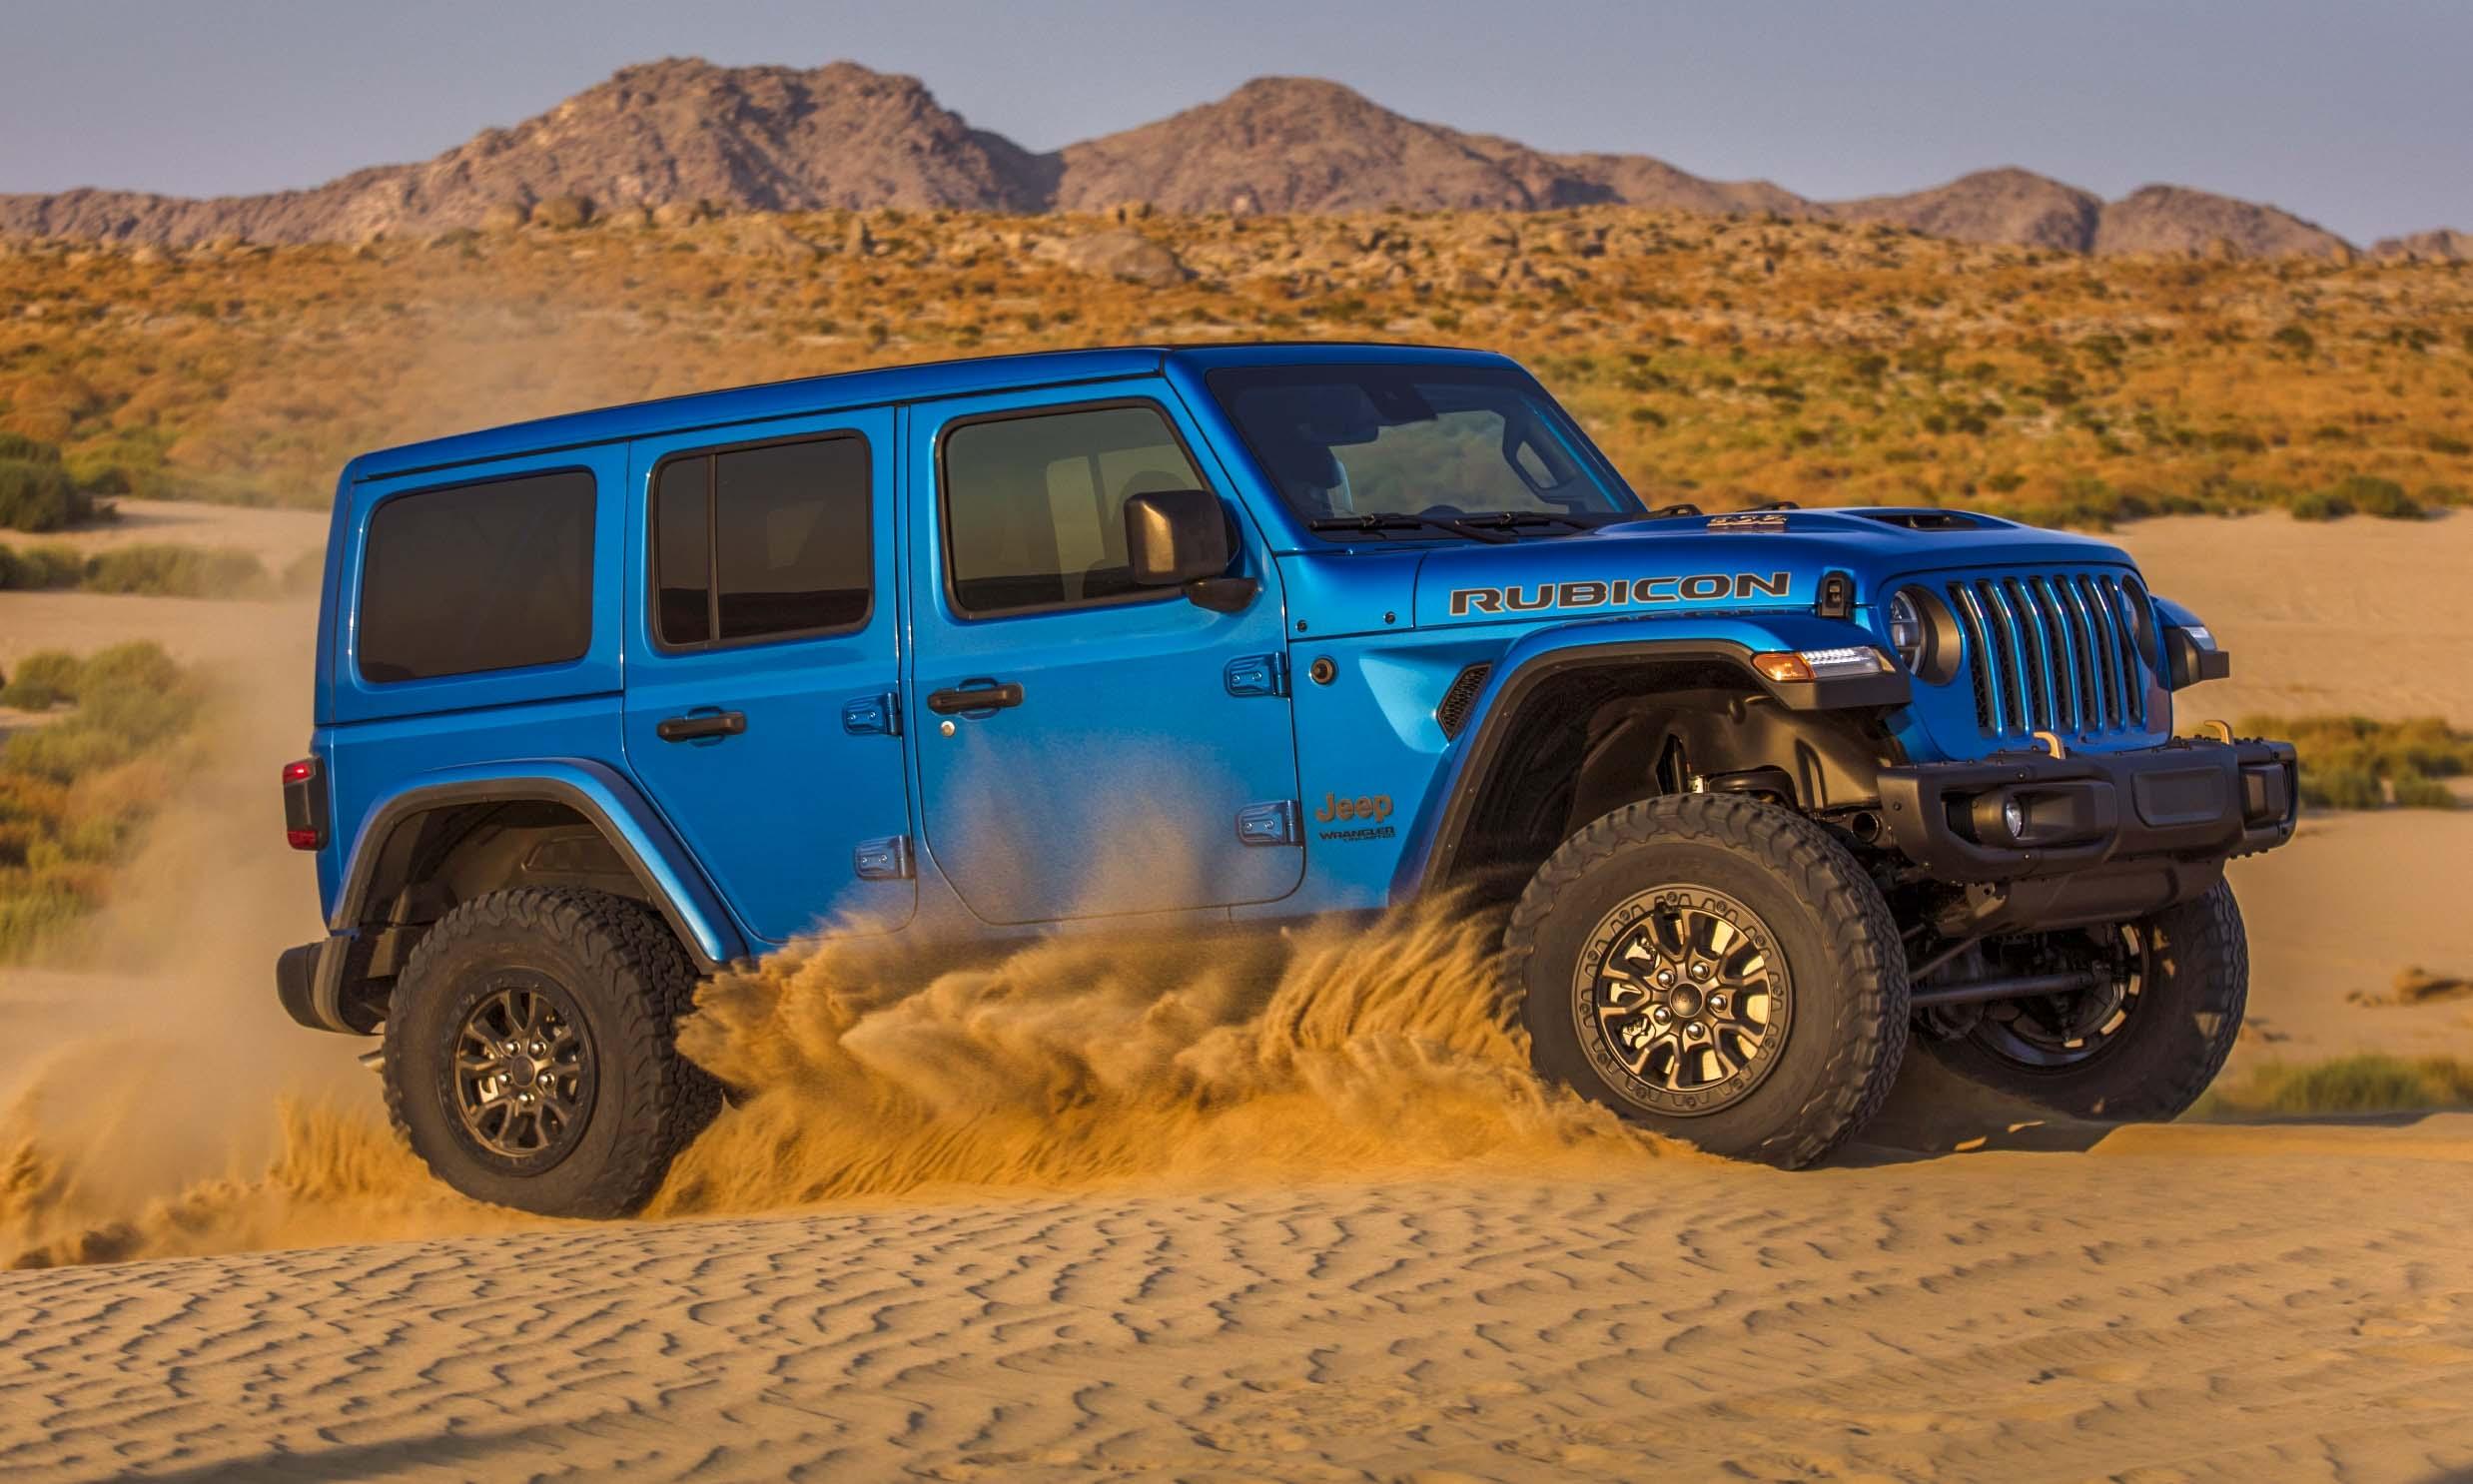 2021 Jeep Wrangler Rubicon 392 The V8 Is Backnbsp